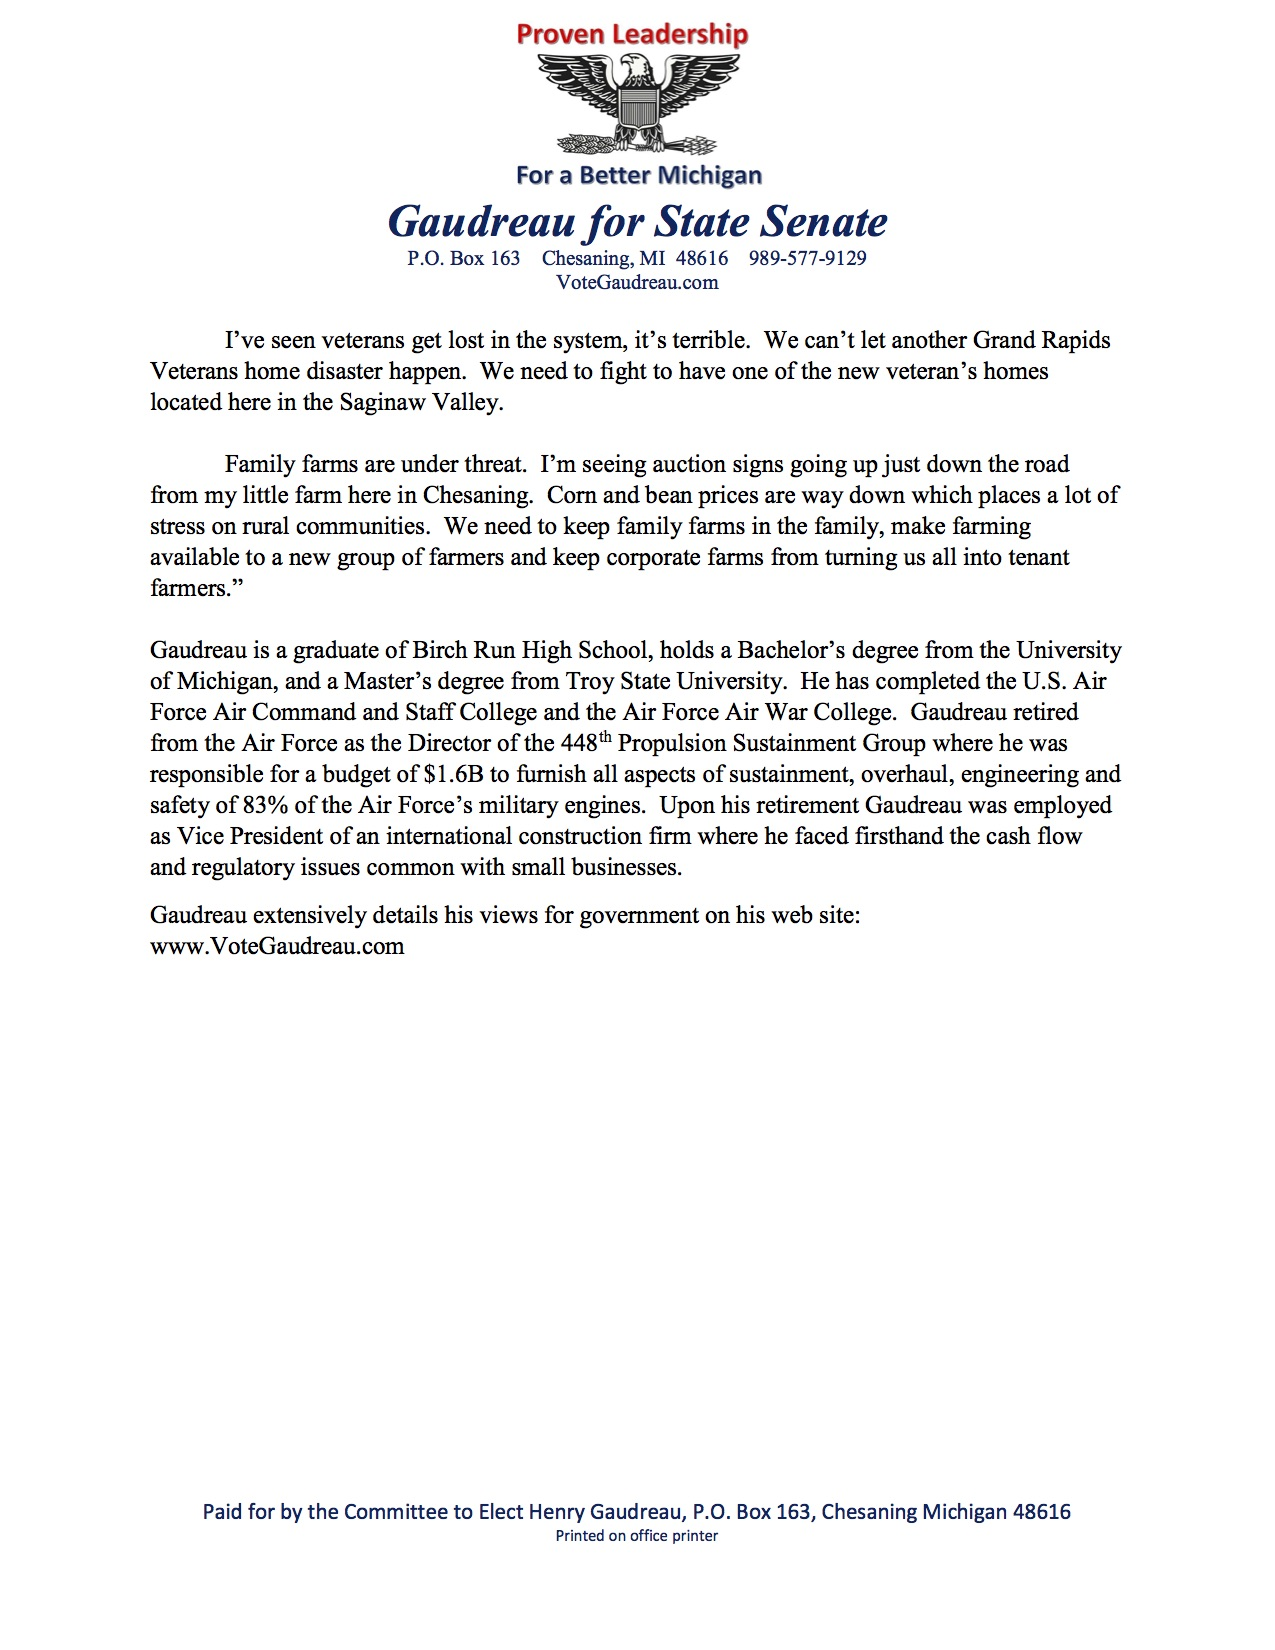 Gaudreau on 2018 Ballot - Press Release.jpg